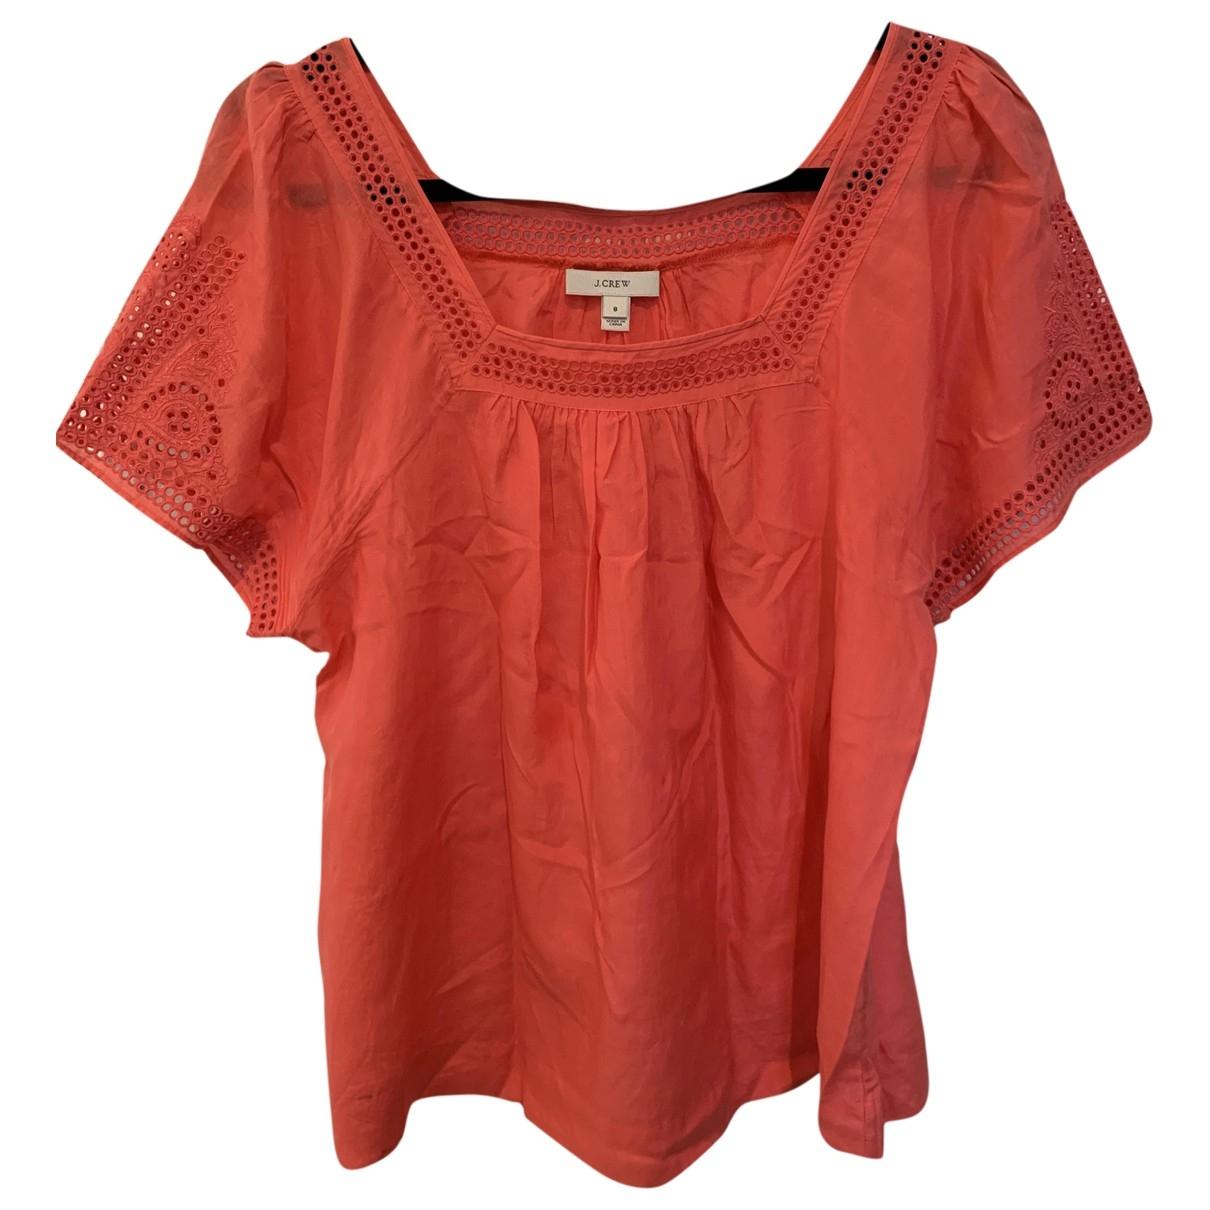 J.crew \N Orange Cotton  top for Women 8 US